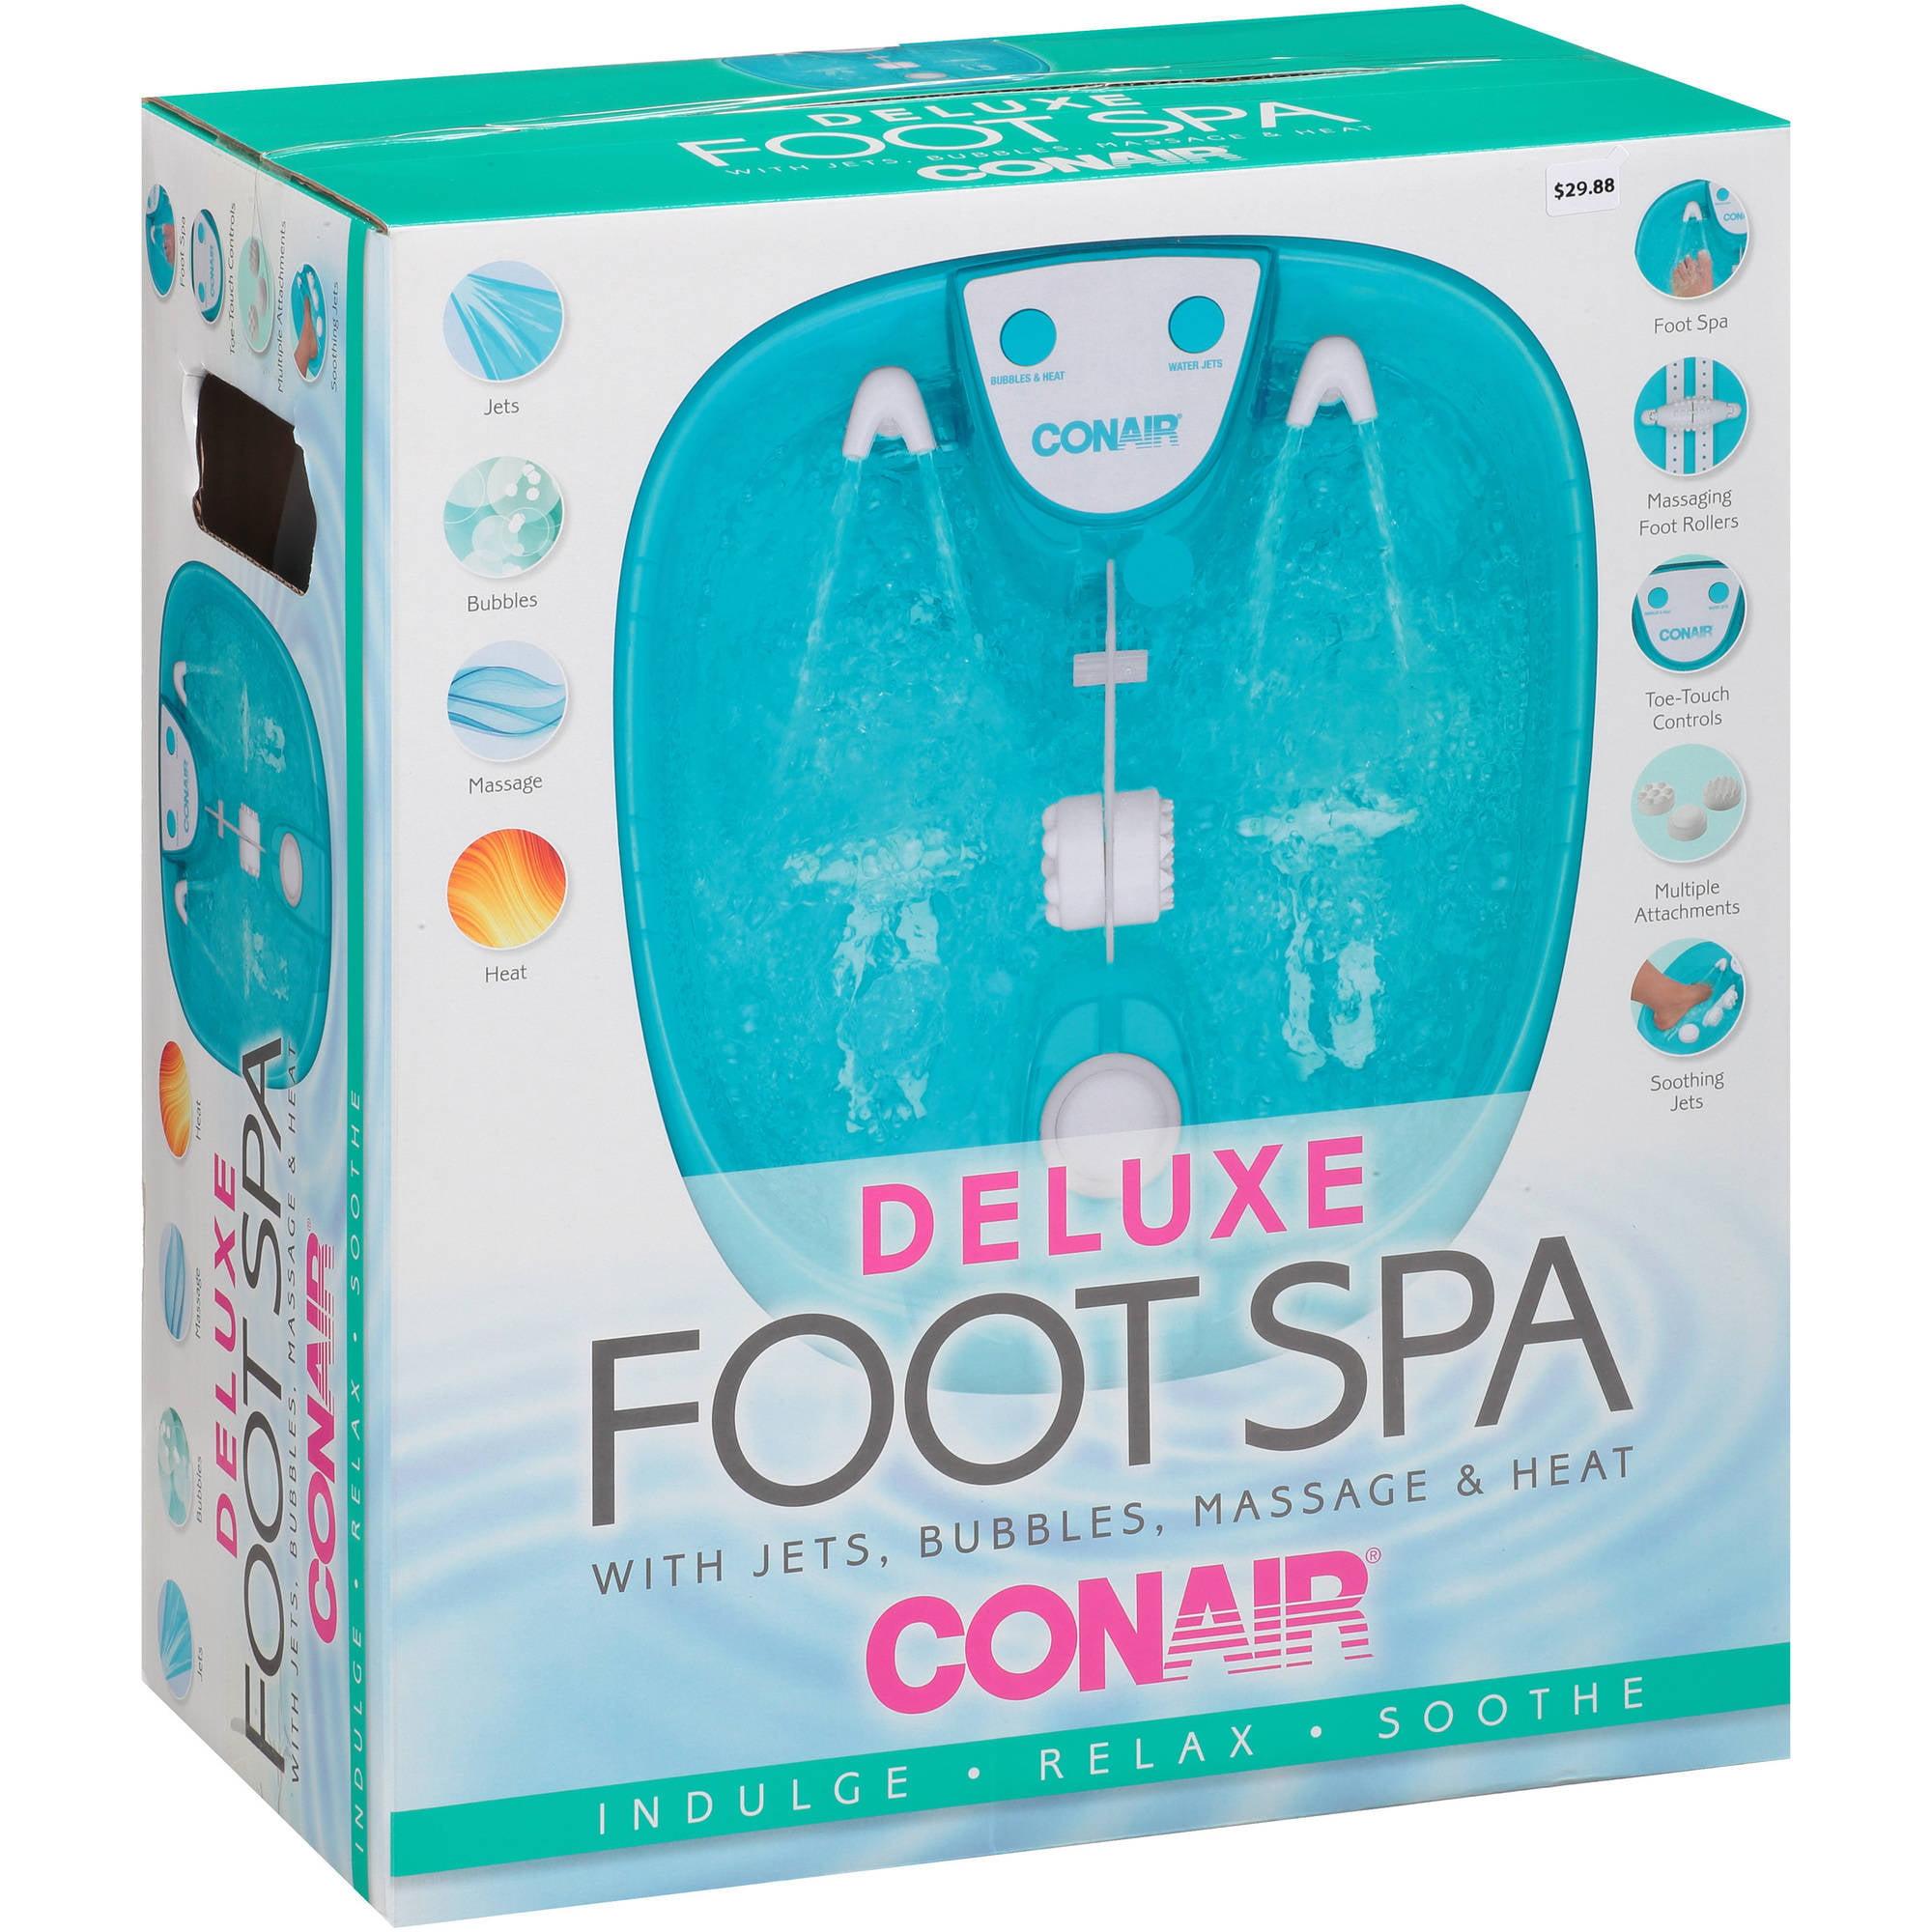 Conair Deluxe Foot Spa with Bubbles, Massage & Heat - Walmart.com